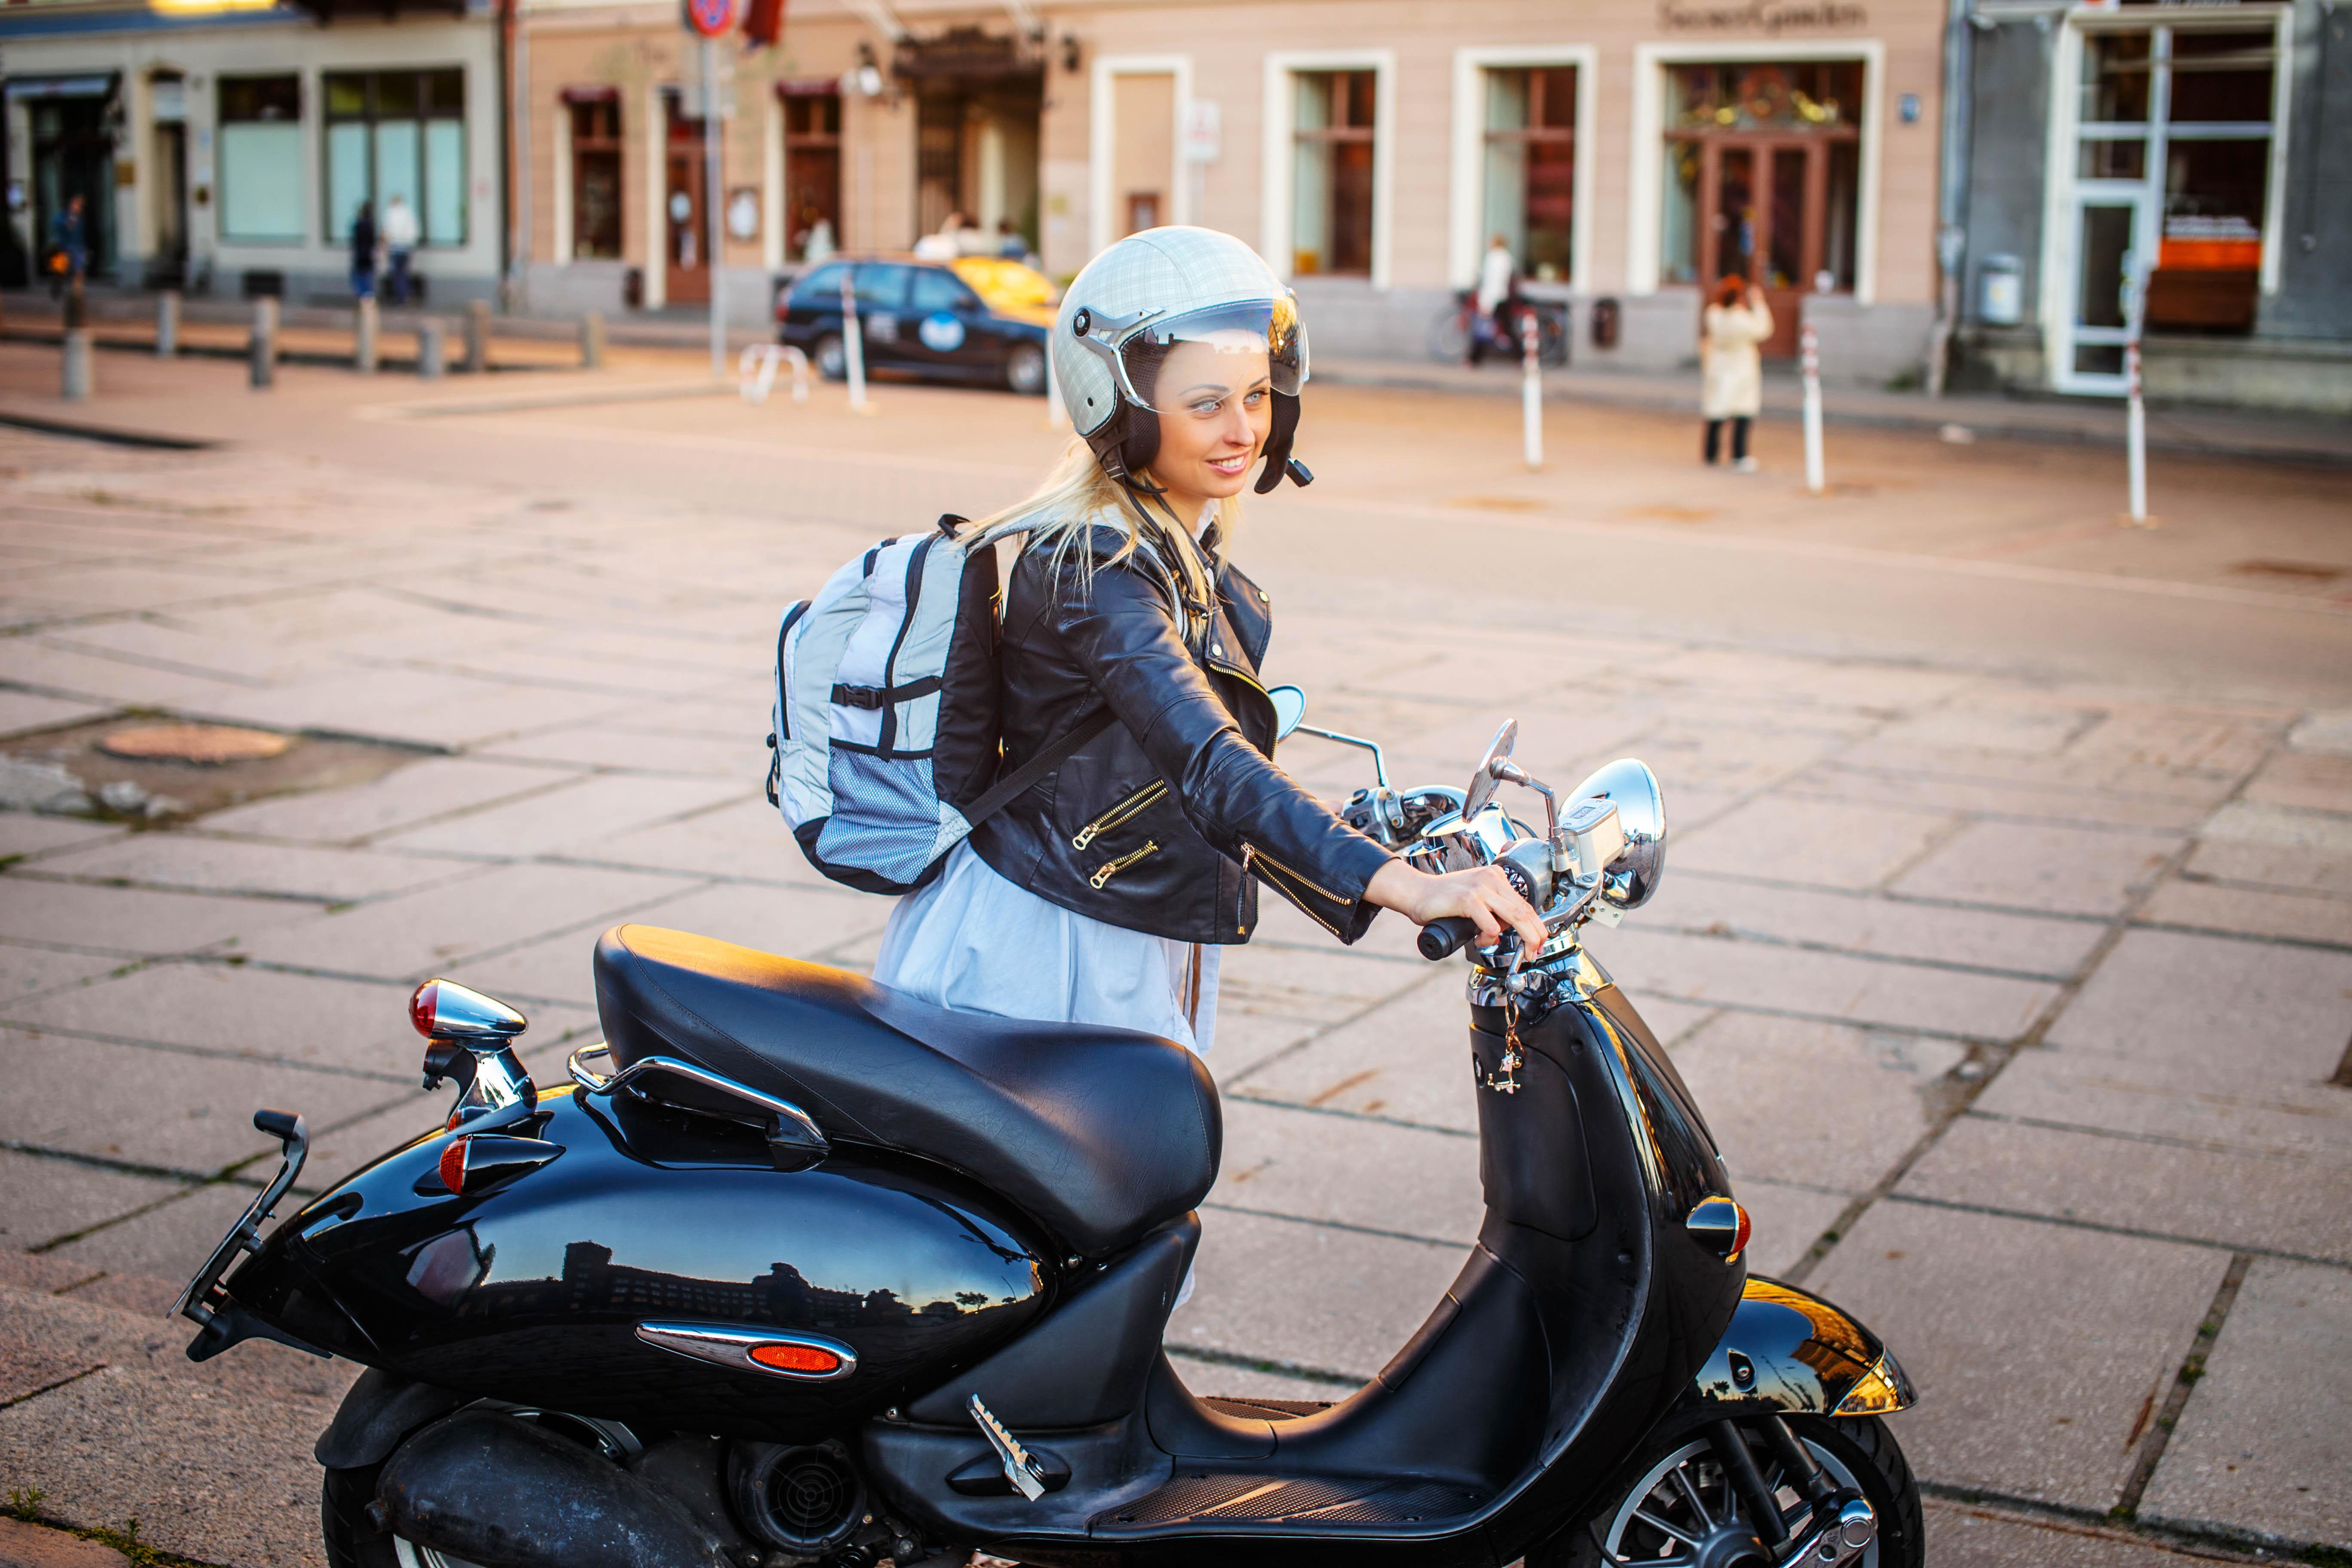 Ung dame med moped i byen